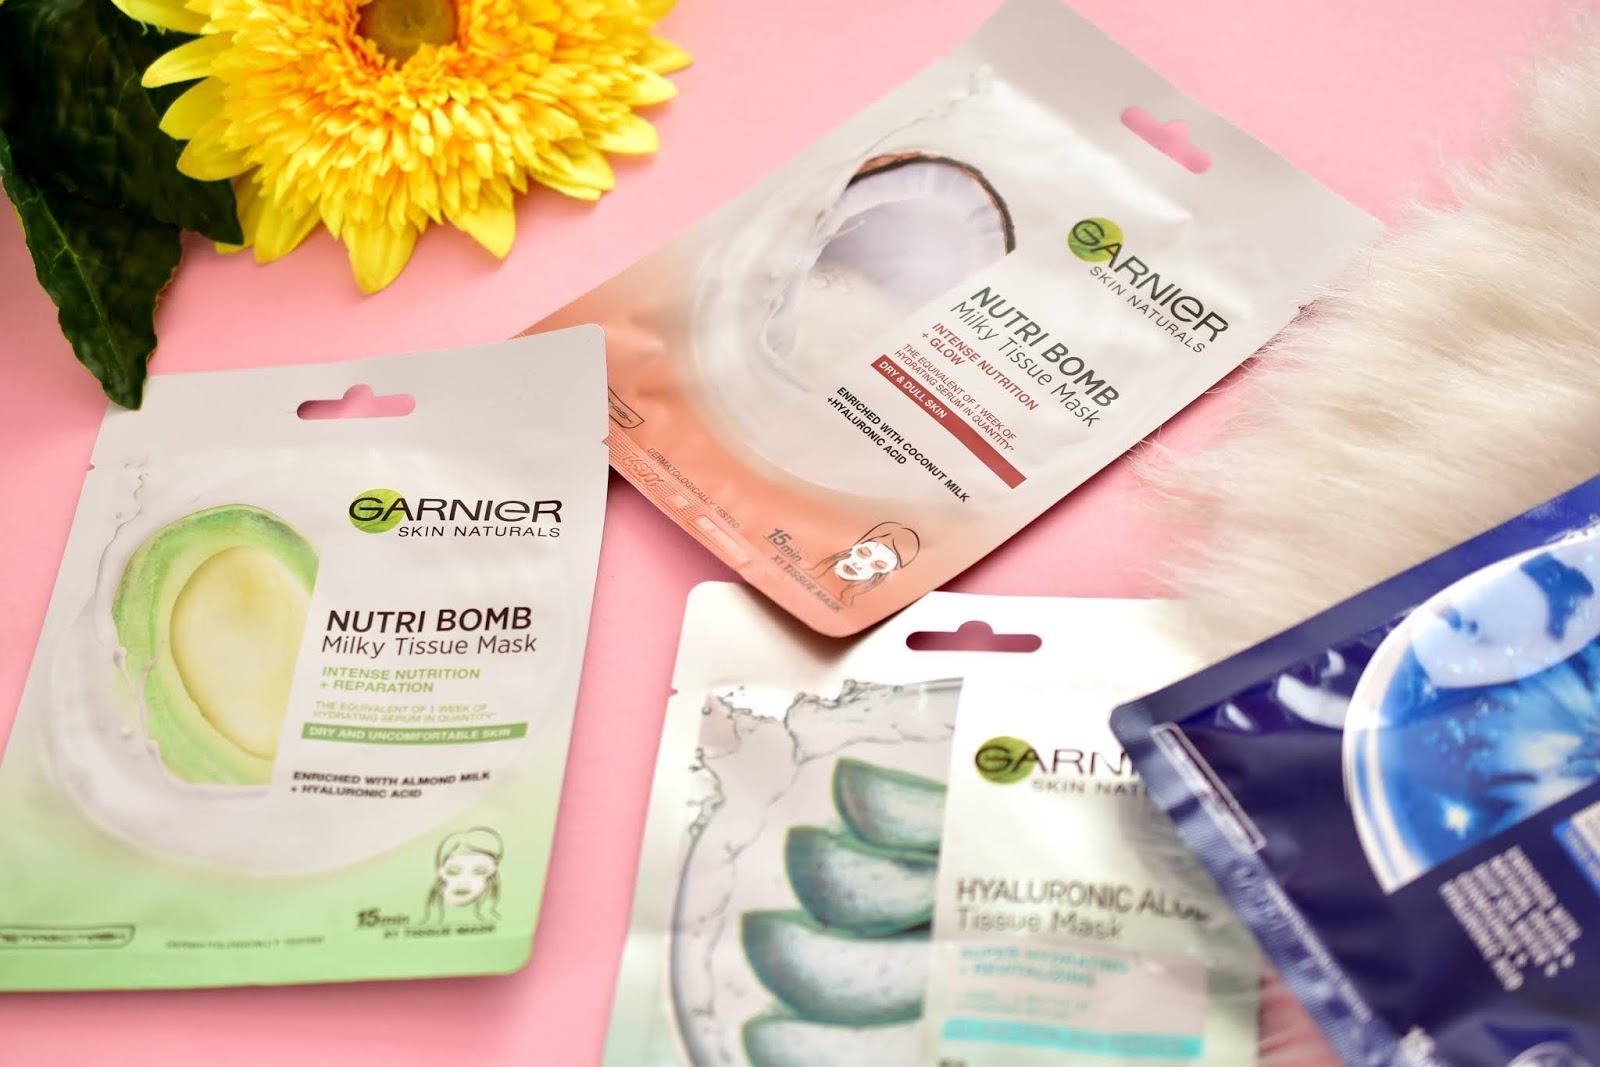 Garnier Nutri Bomb Milky Tissue Mask